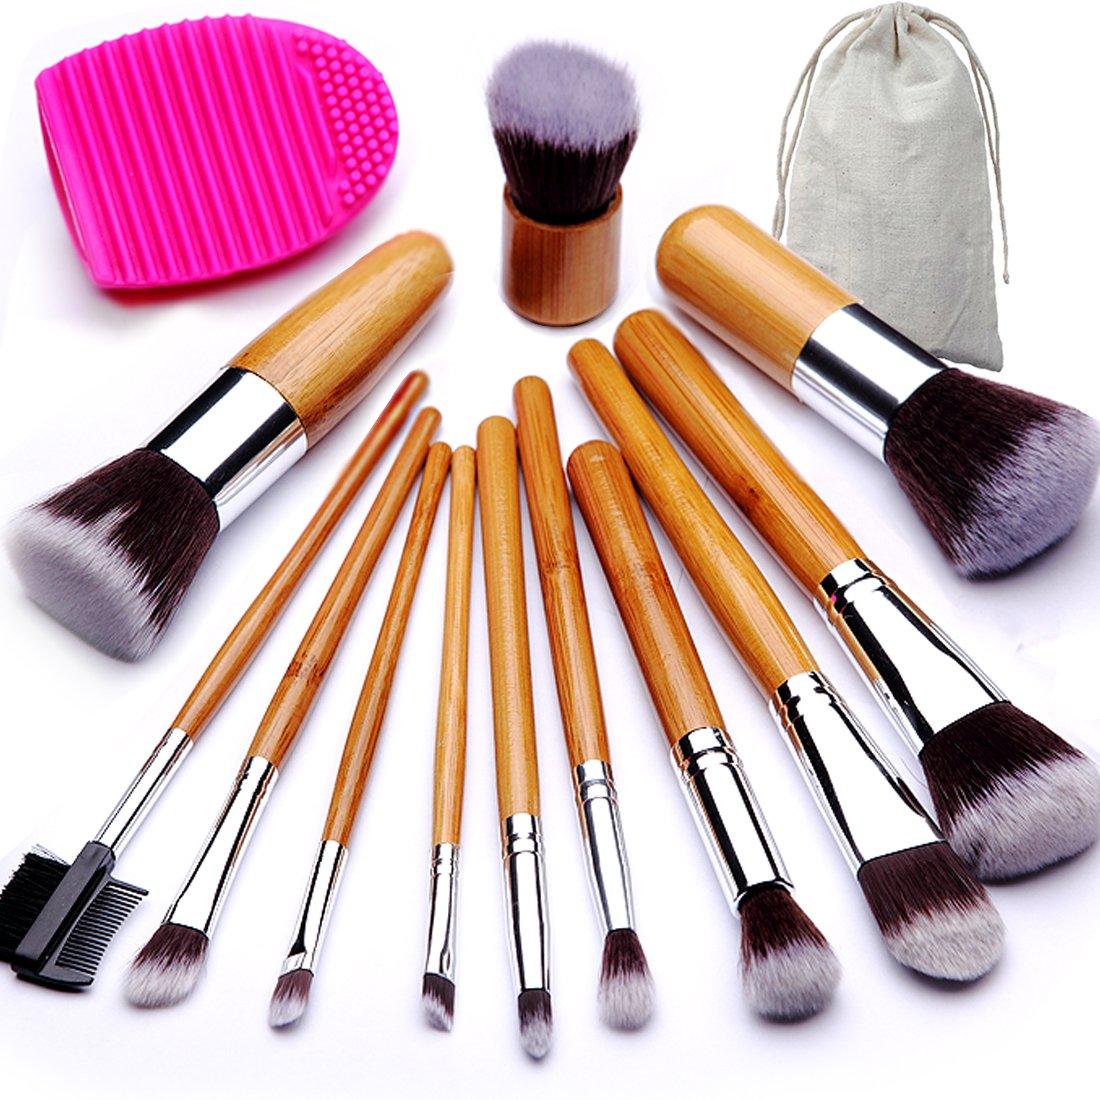 BEAKEY Makeup Brush Set Bamboo Handle Premium Synthetic Kabuki Foundation Blending Blush Eyeshadow Concealer Powder Brush with 1 Brush Egg & 1 Cloth Bag (12+2 Pcs)